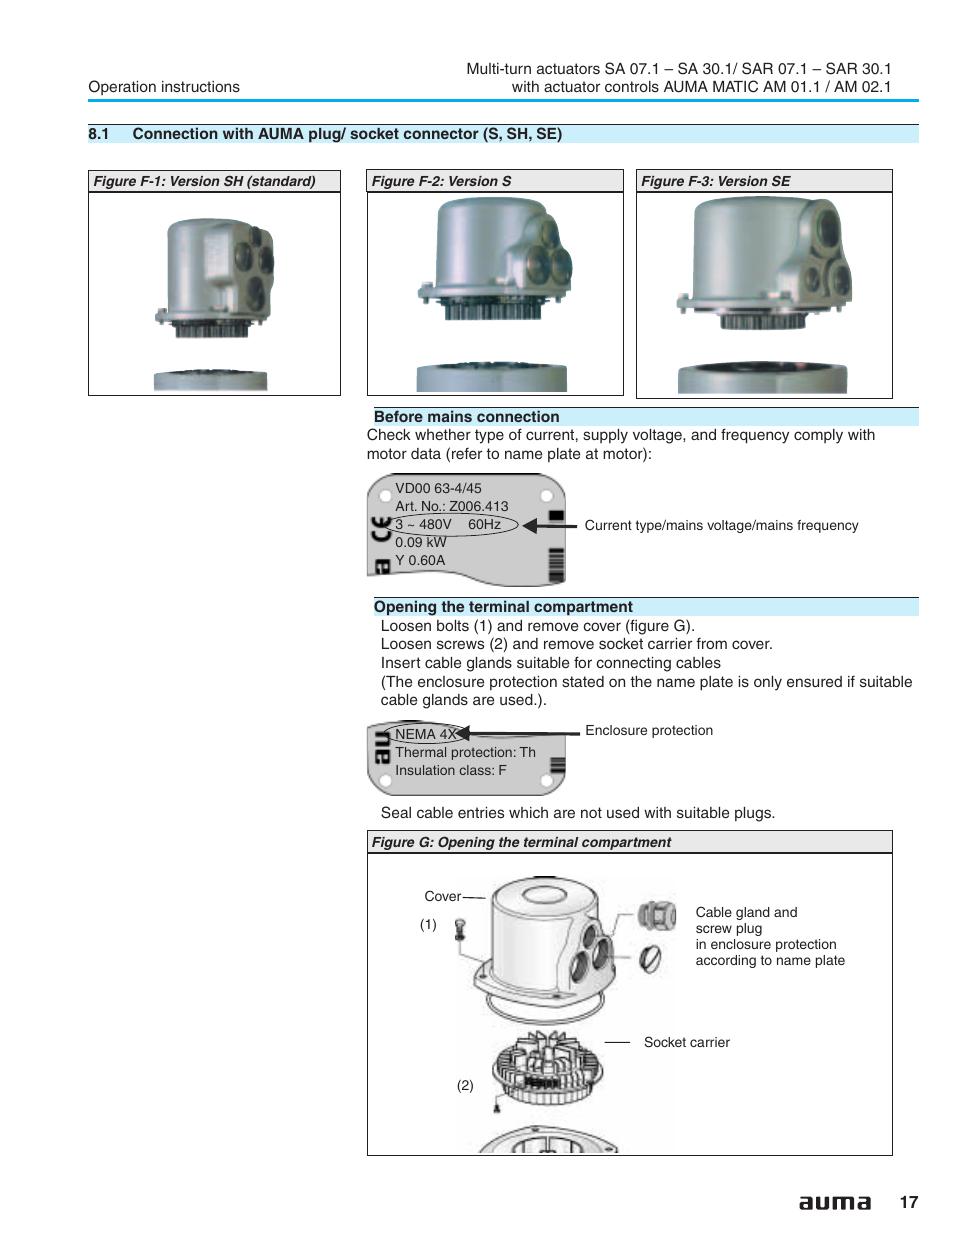 auma electric multi turn actuators sa 07 1 16 1 sar 07 1 16 1 matic am 01 1 02 1 user